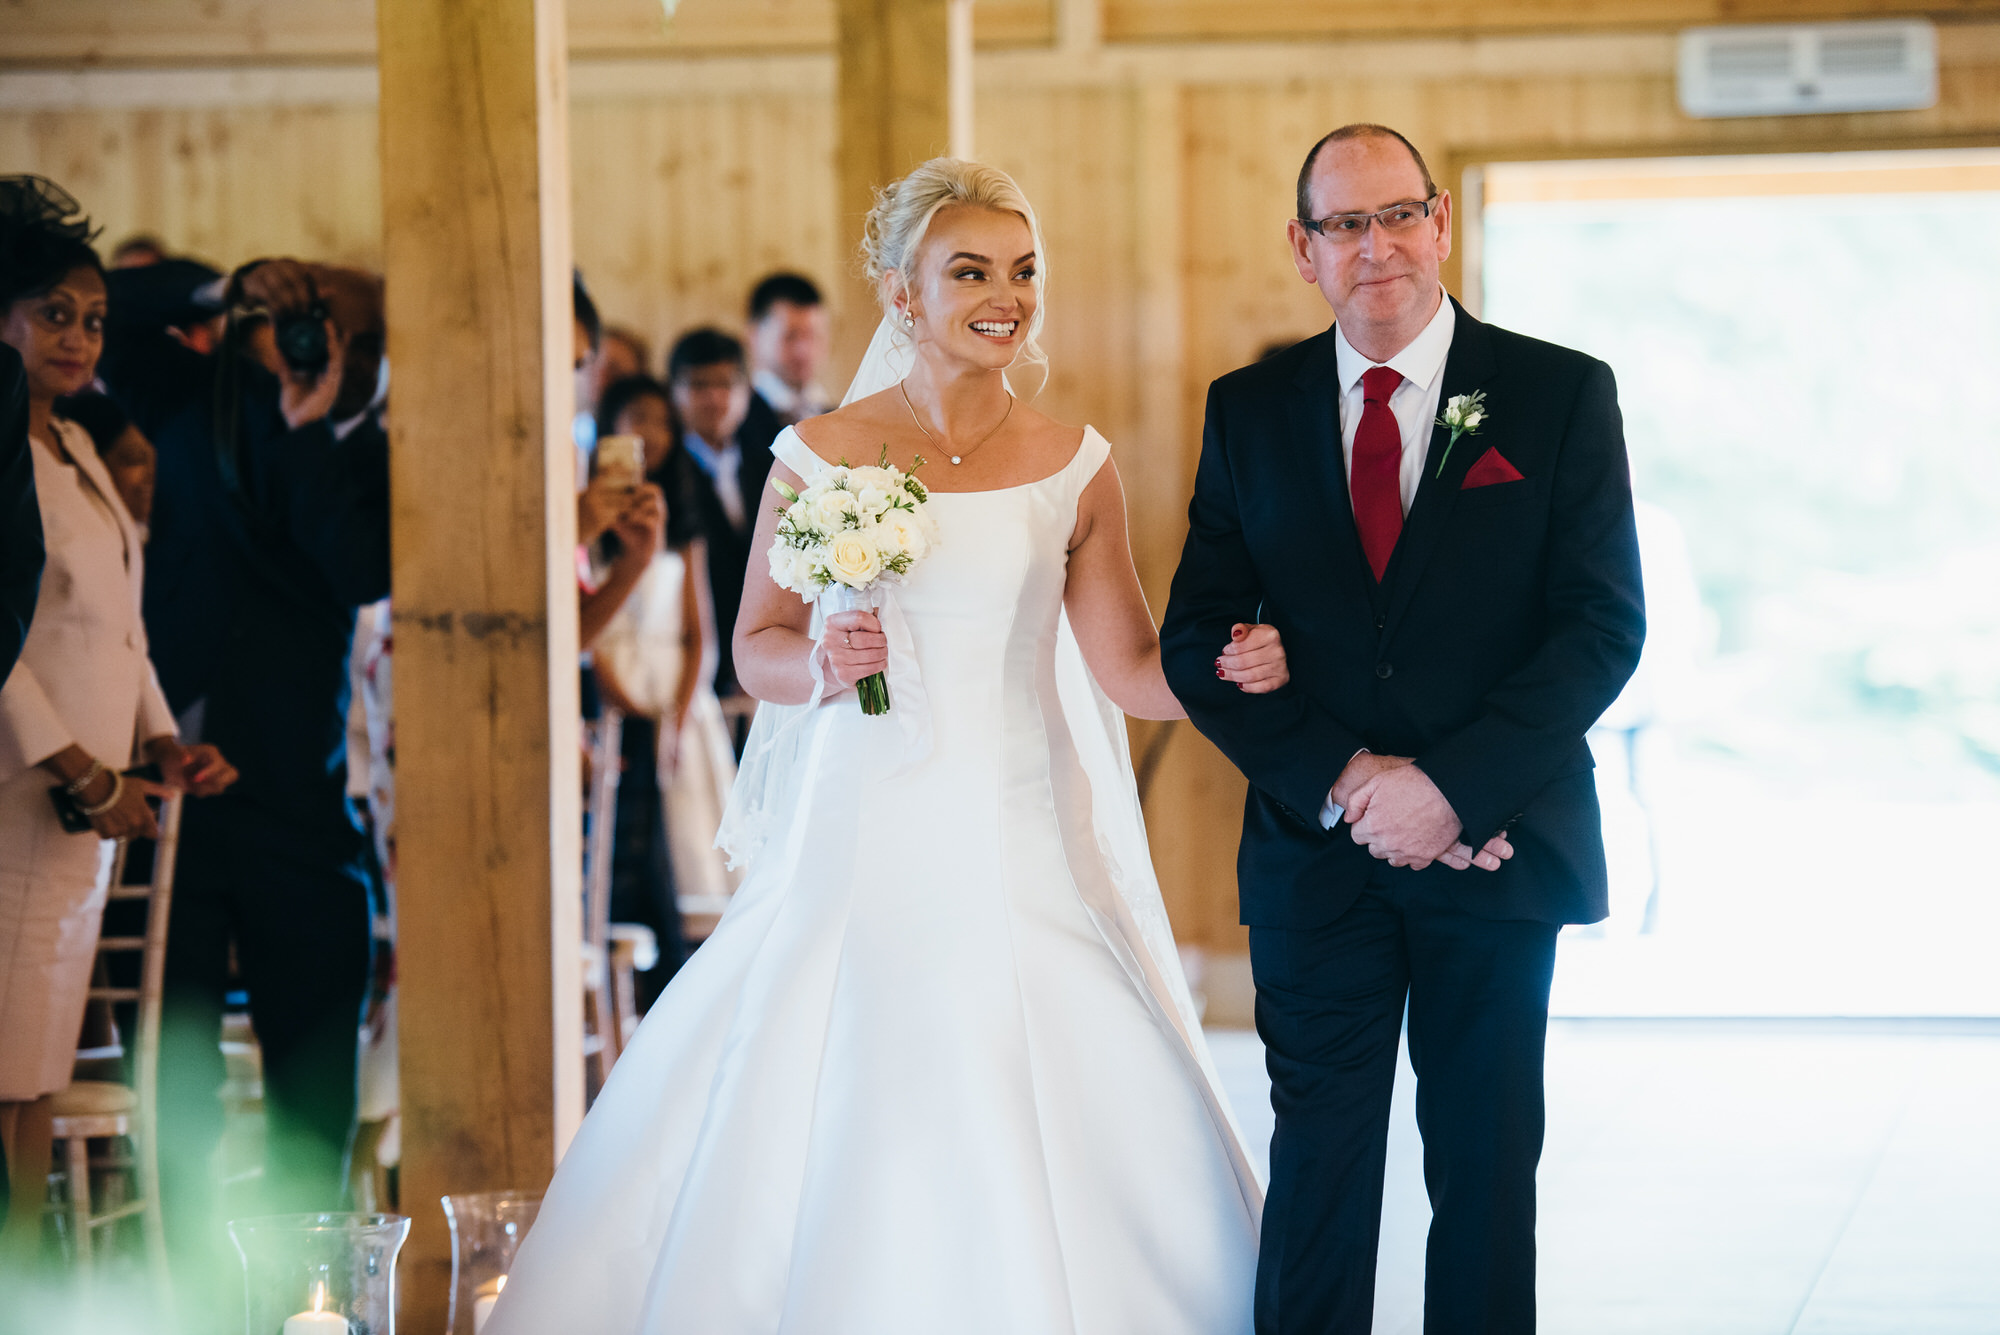 Merrydale manor wedding photography 043